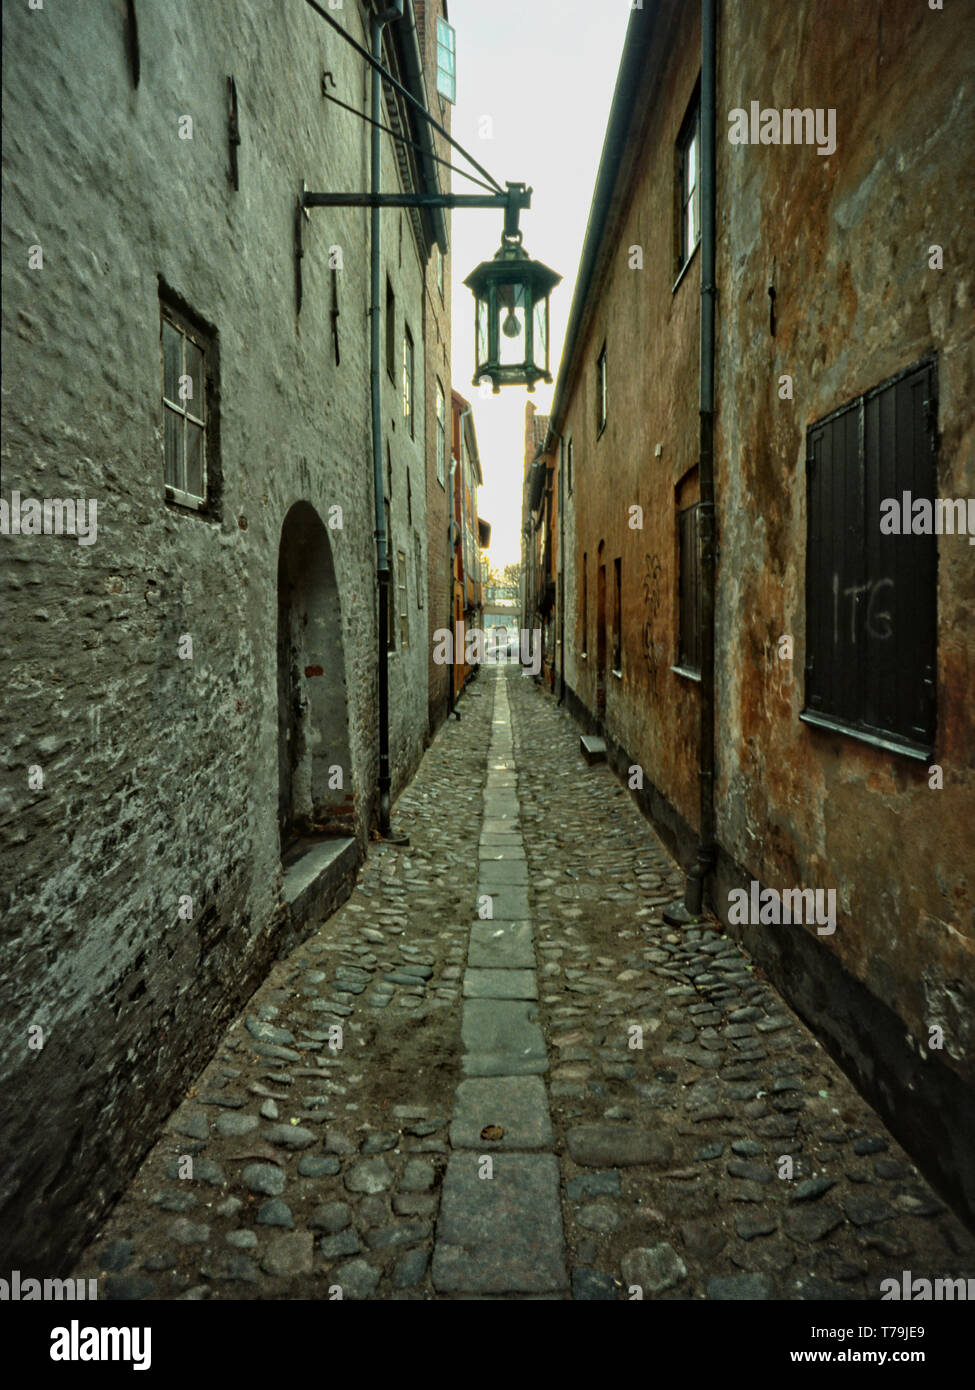 Gamle Faergestraede (Old Ferrystreet) in Helsingoer, Sjaelland, Denmark - Stock Image